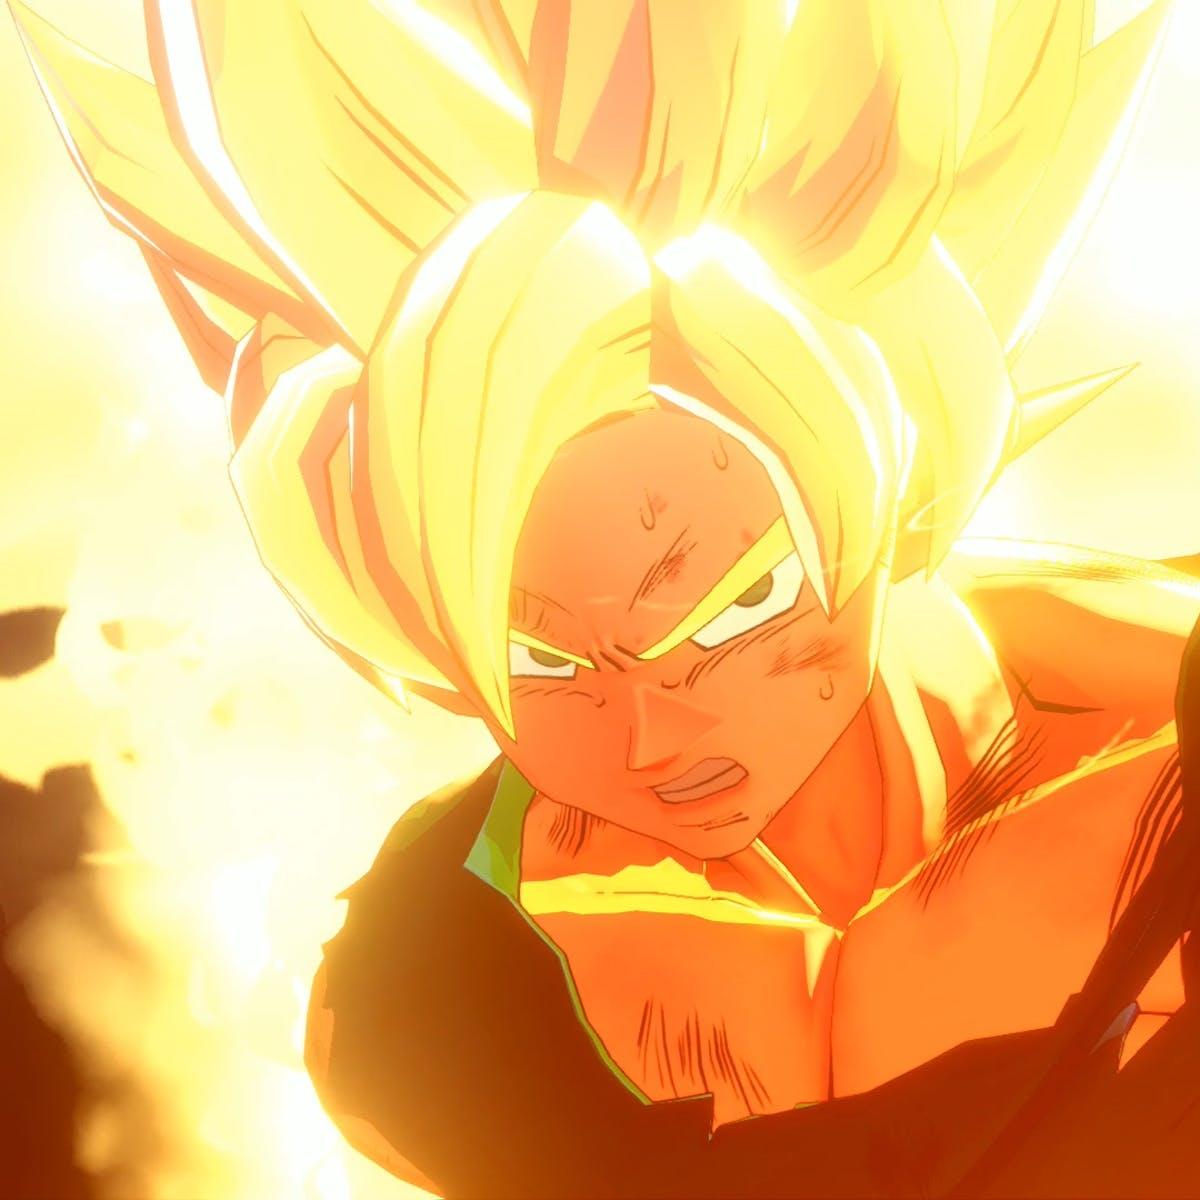 How to unlock Goku's Super Saiyan transformation in 'Dragon Ball Z Kakarot'